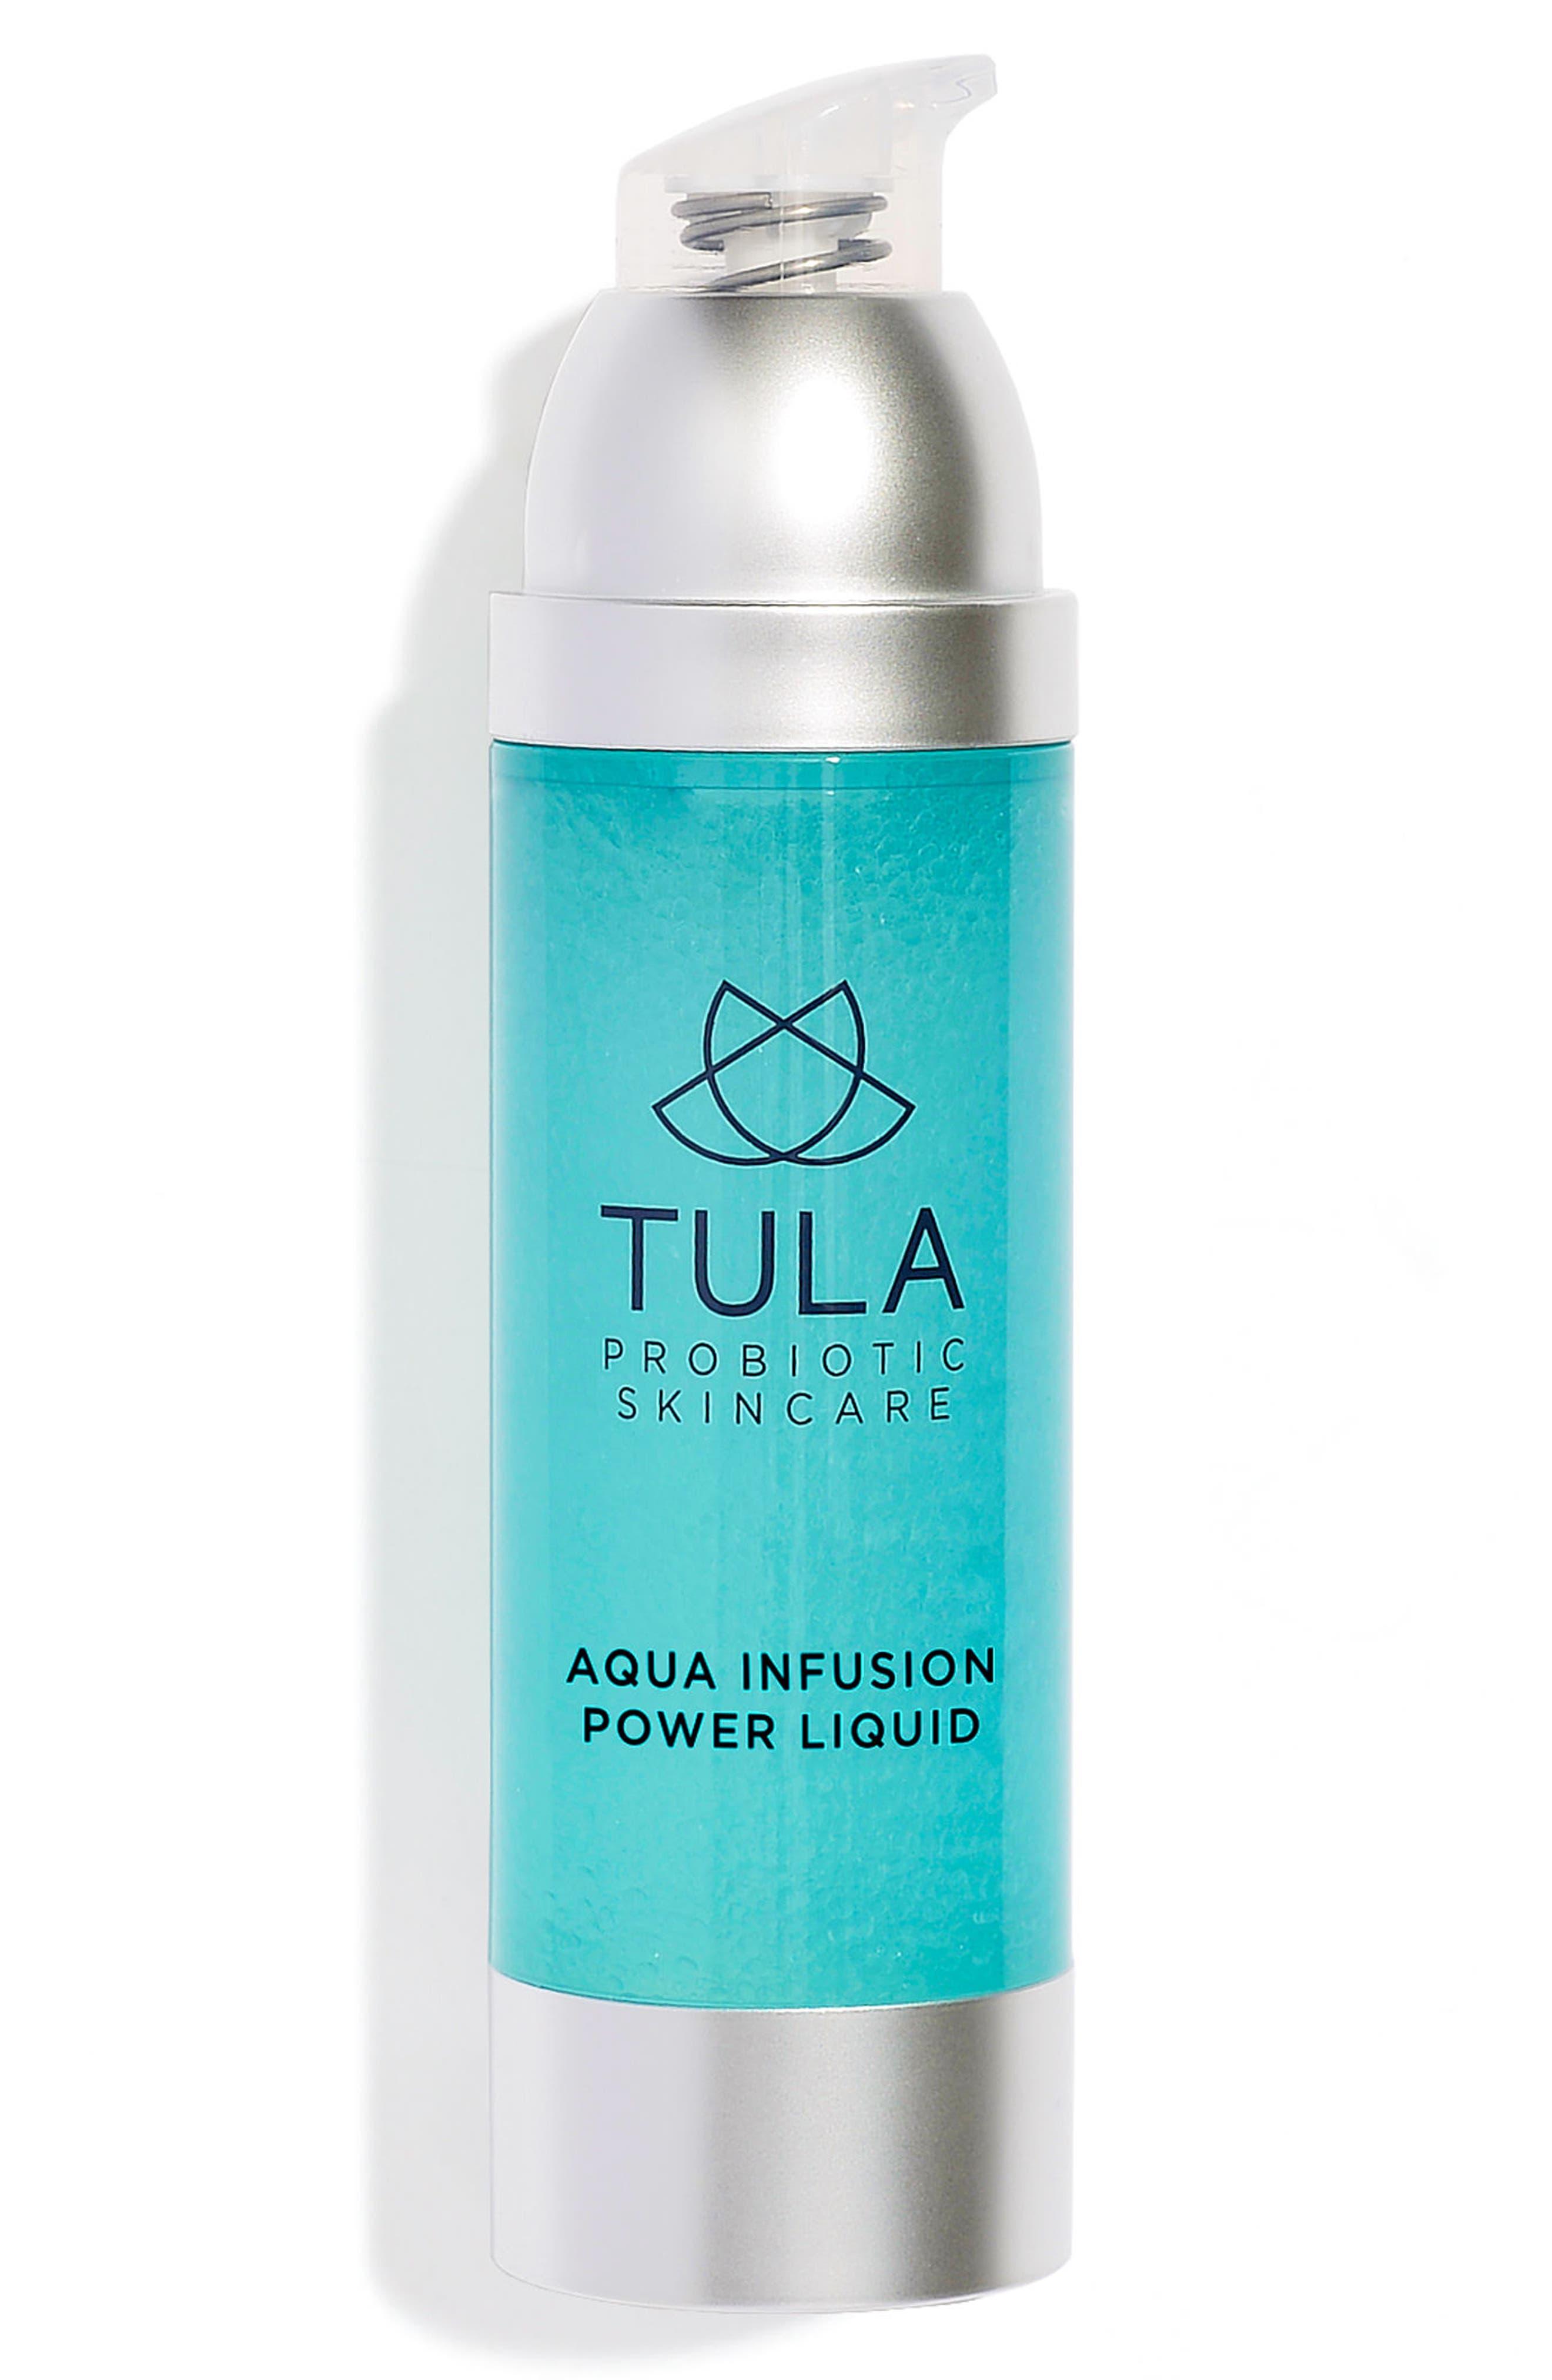 TULA PROBIOTIC SKINCARE, Aqua Infusion Power Liquid, Alternate thumbnail 2, color, NO COLOR